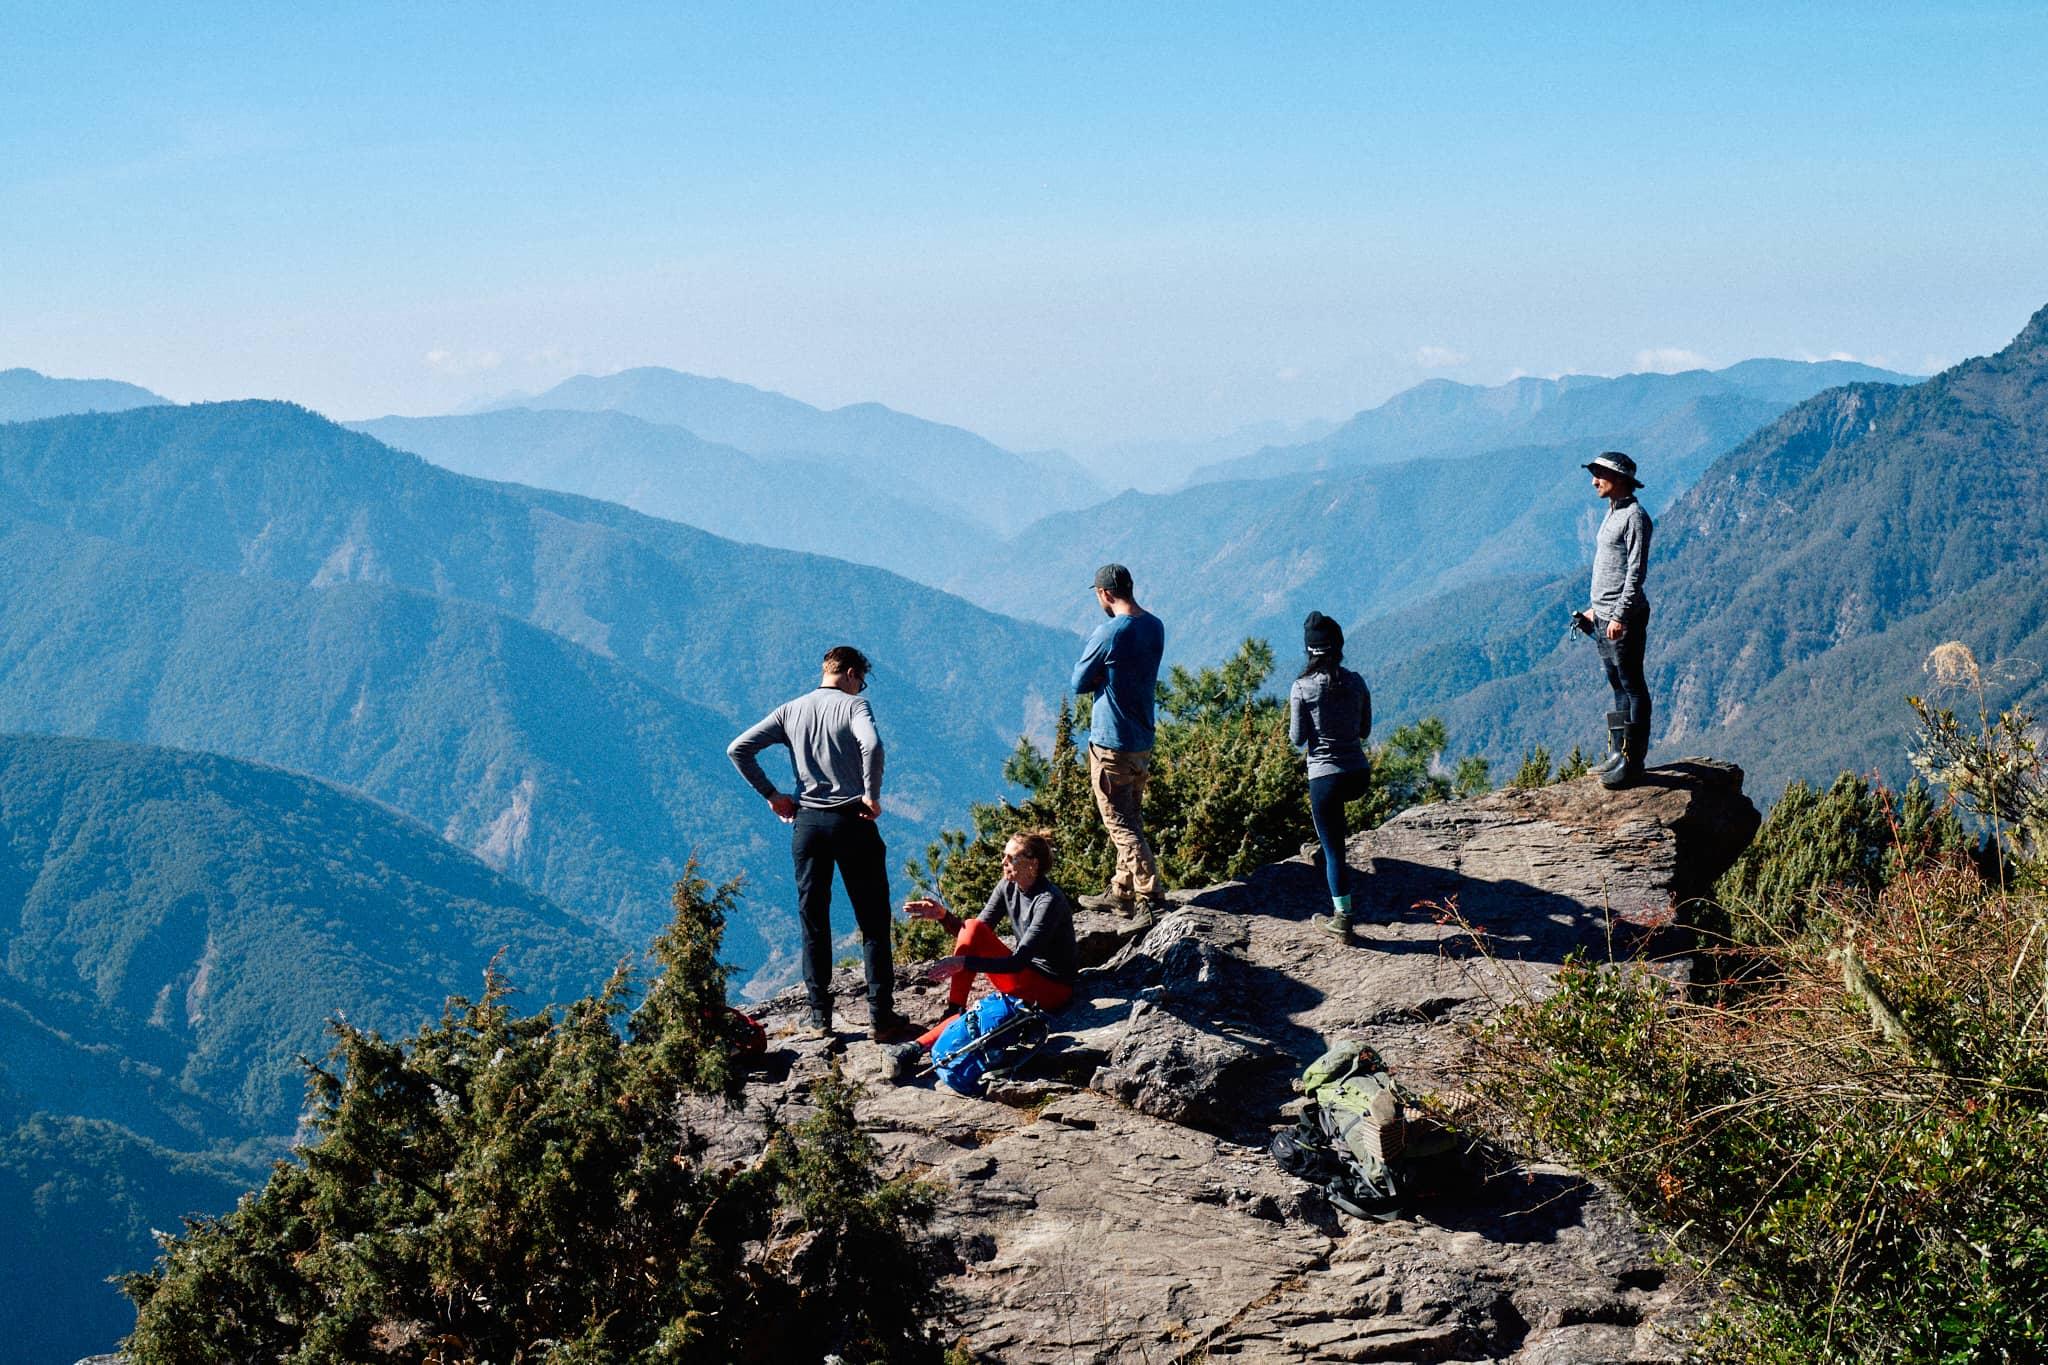 jade mountain hike with imagine taiwan